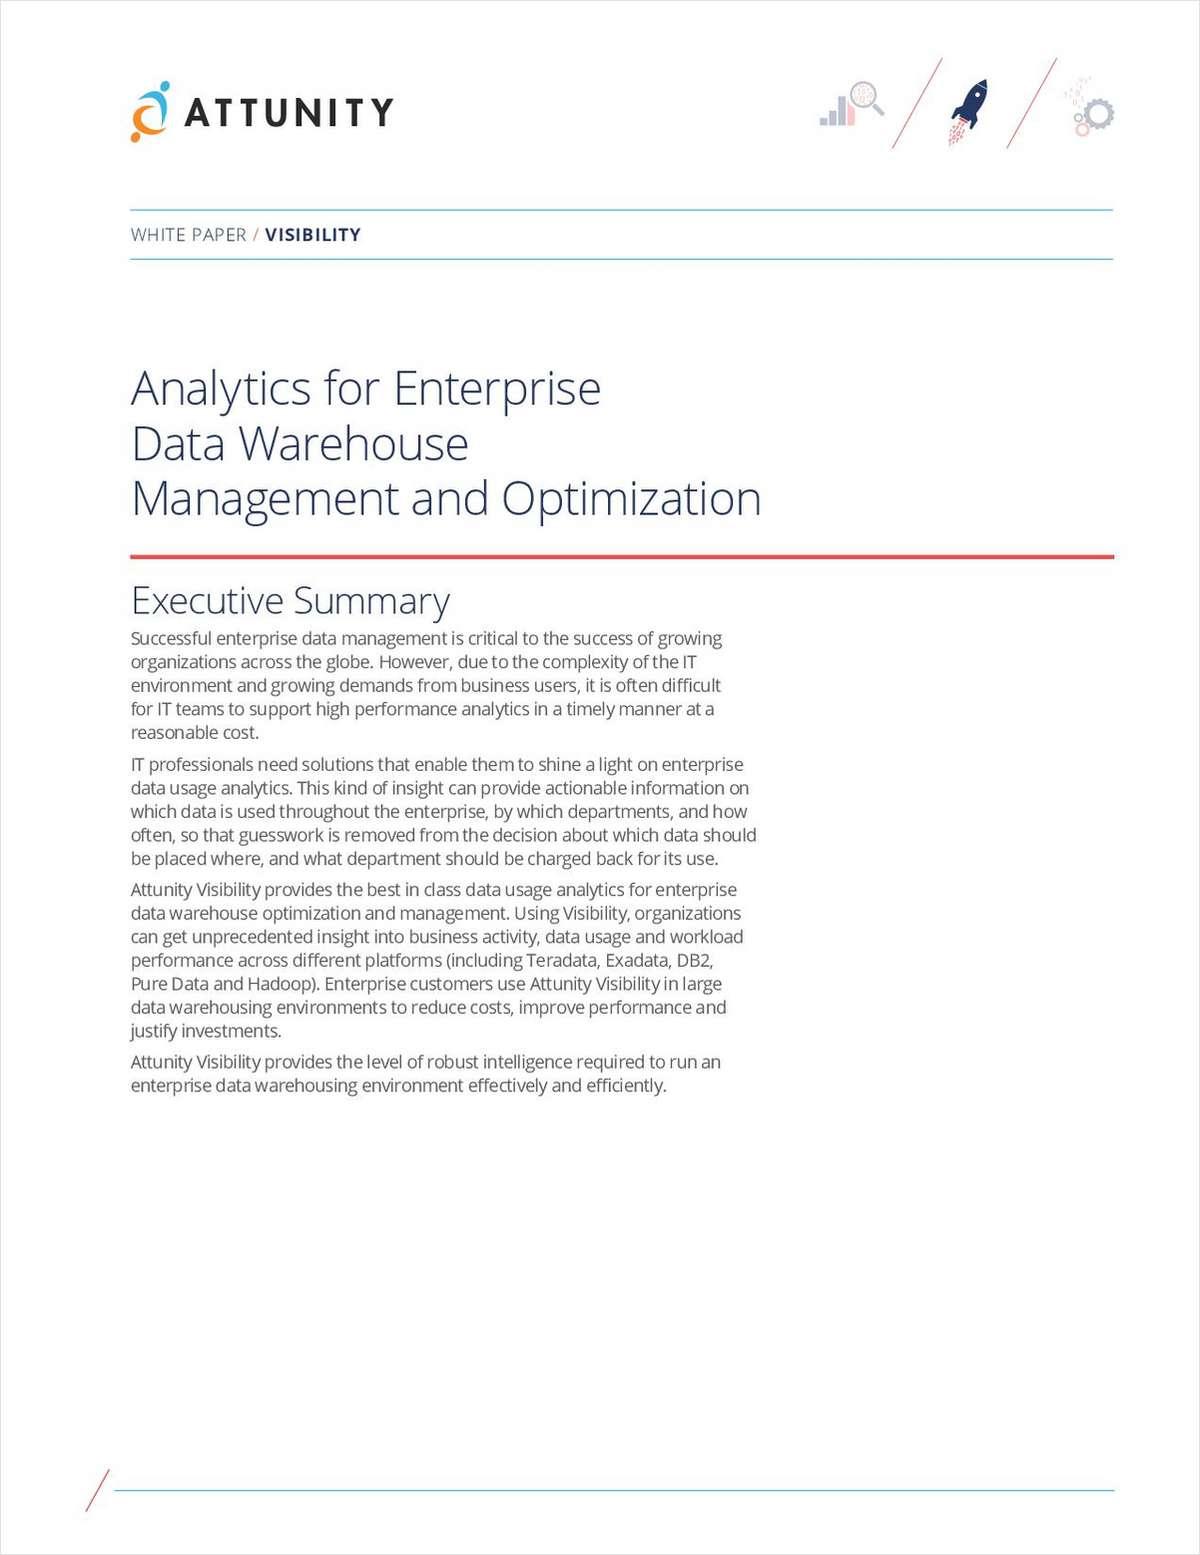 Analytics for Enterprise Data Warehouse Management and Optimization